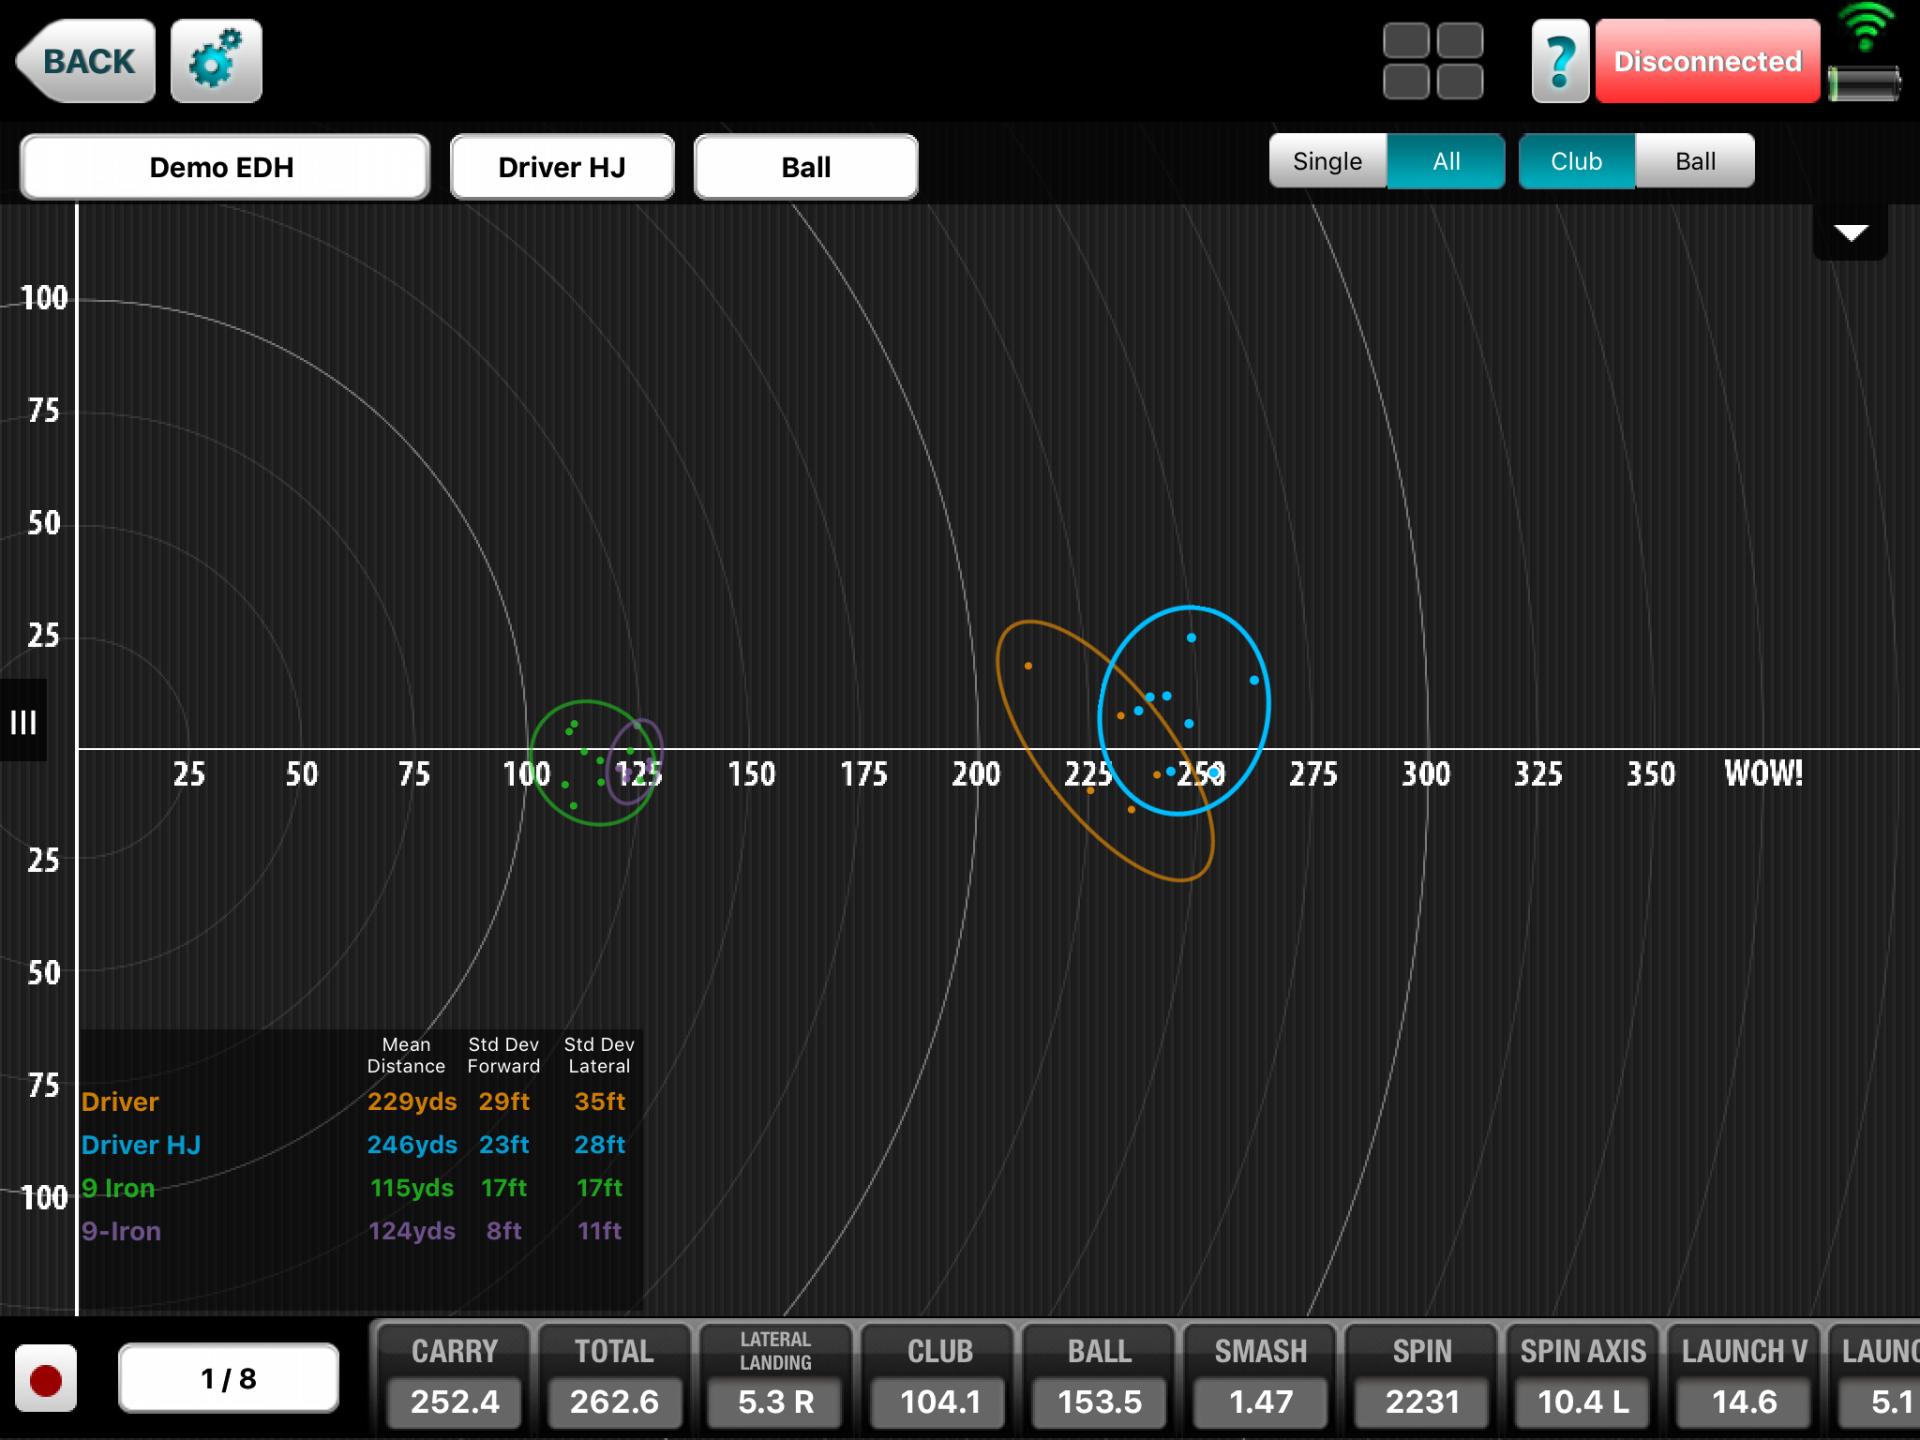 Shot Dispersion Pattern